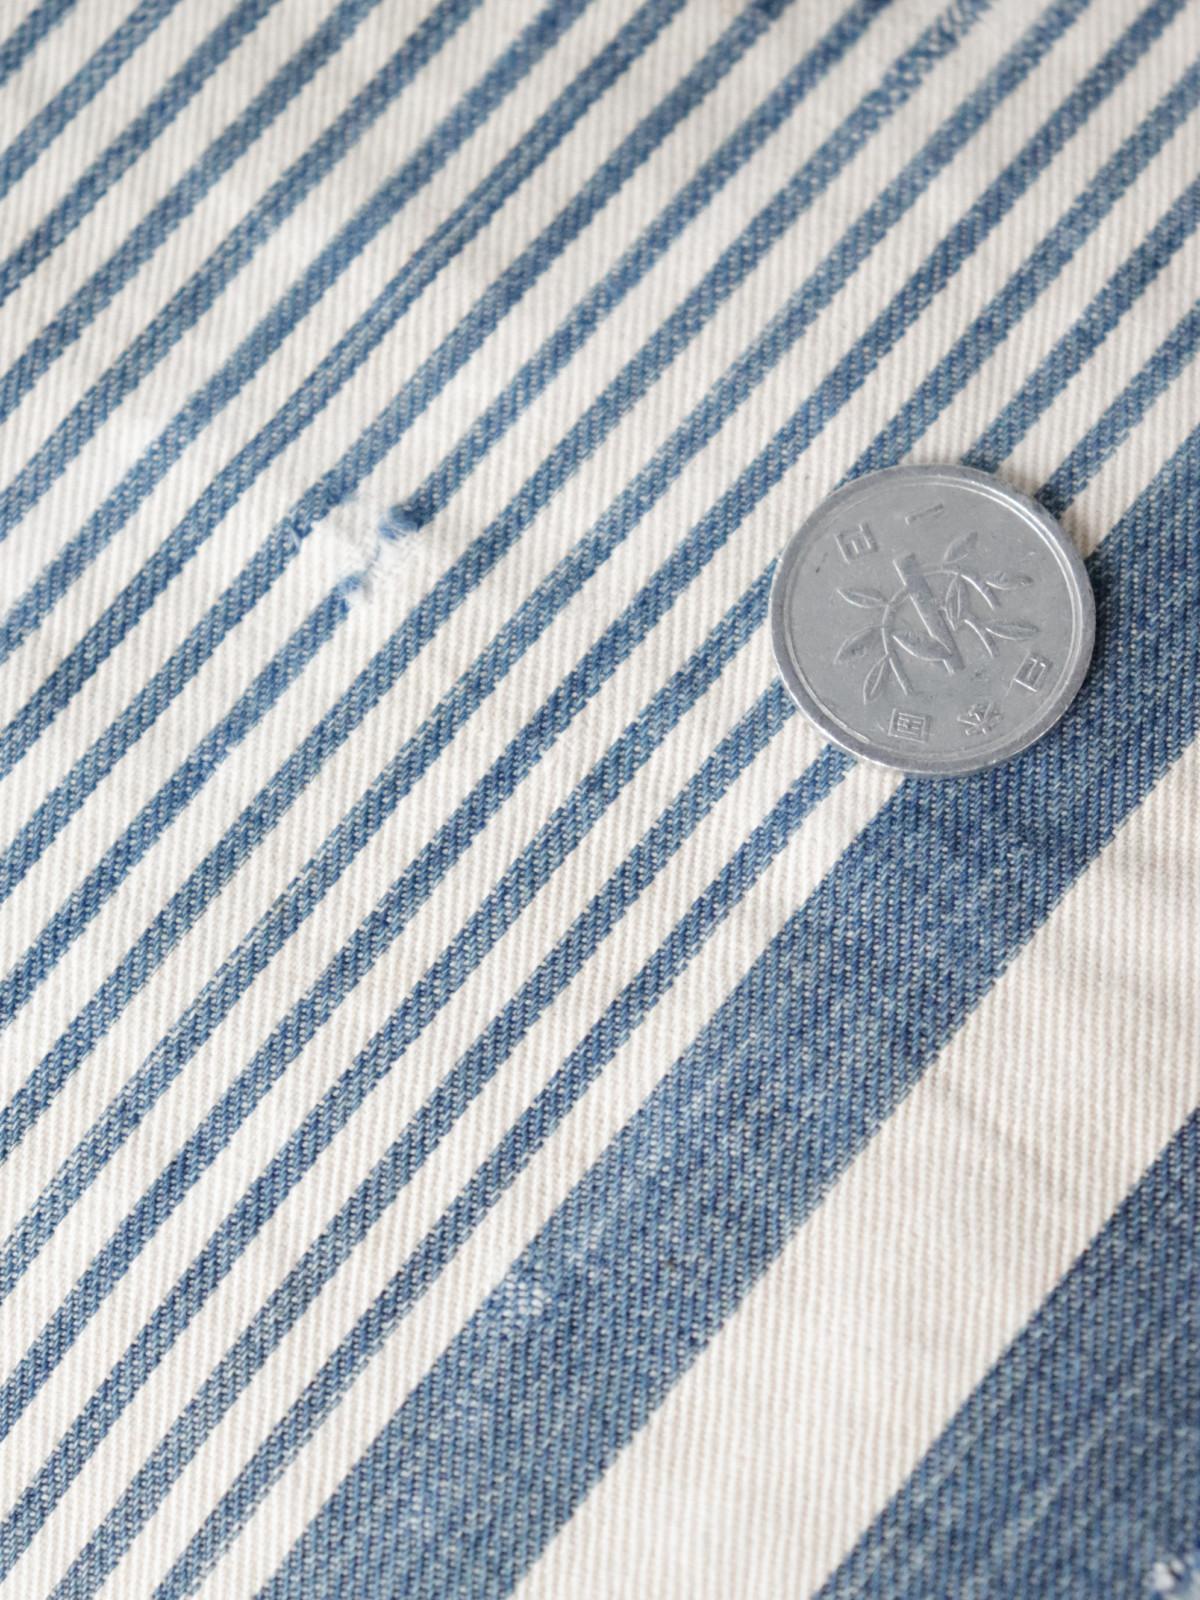 Ticking fabric, indigo, antique, cushion, brown remake